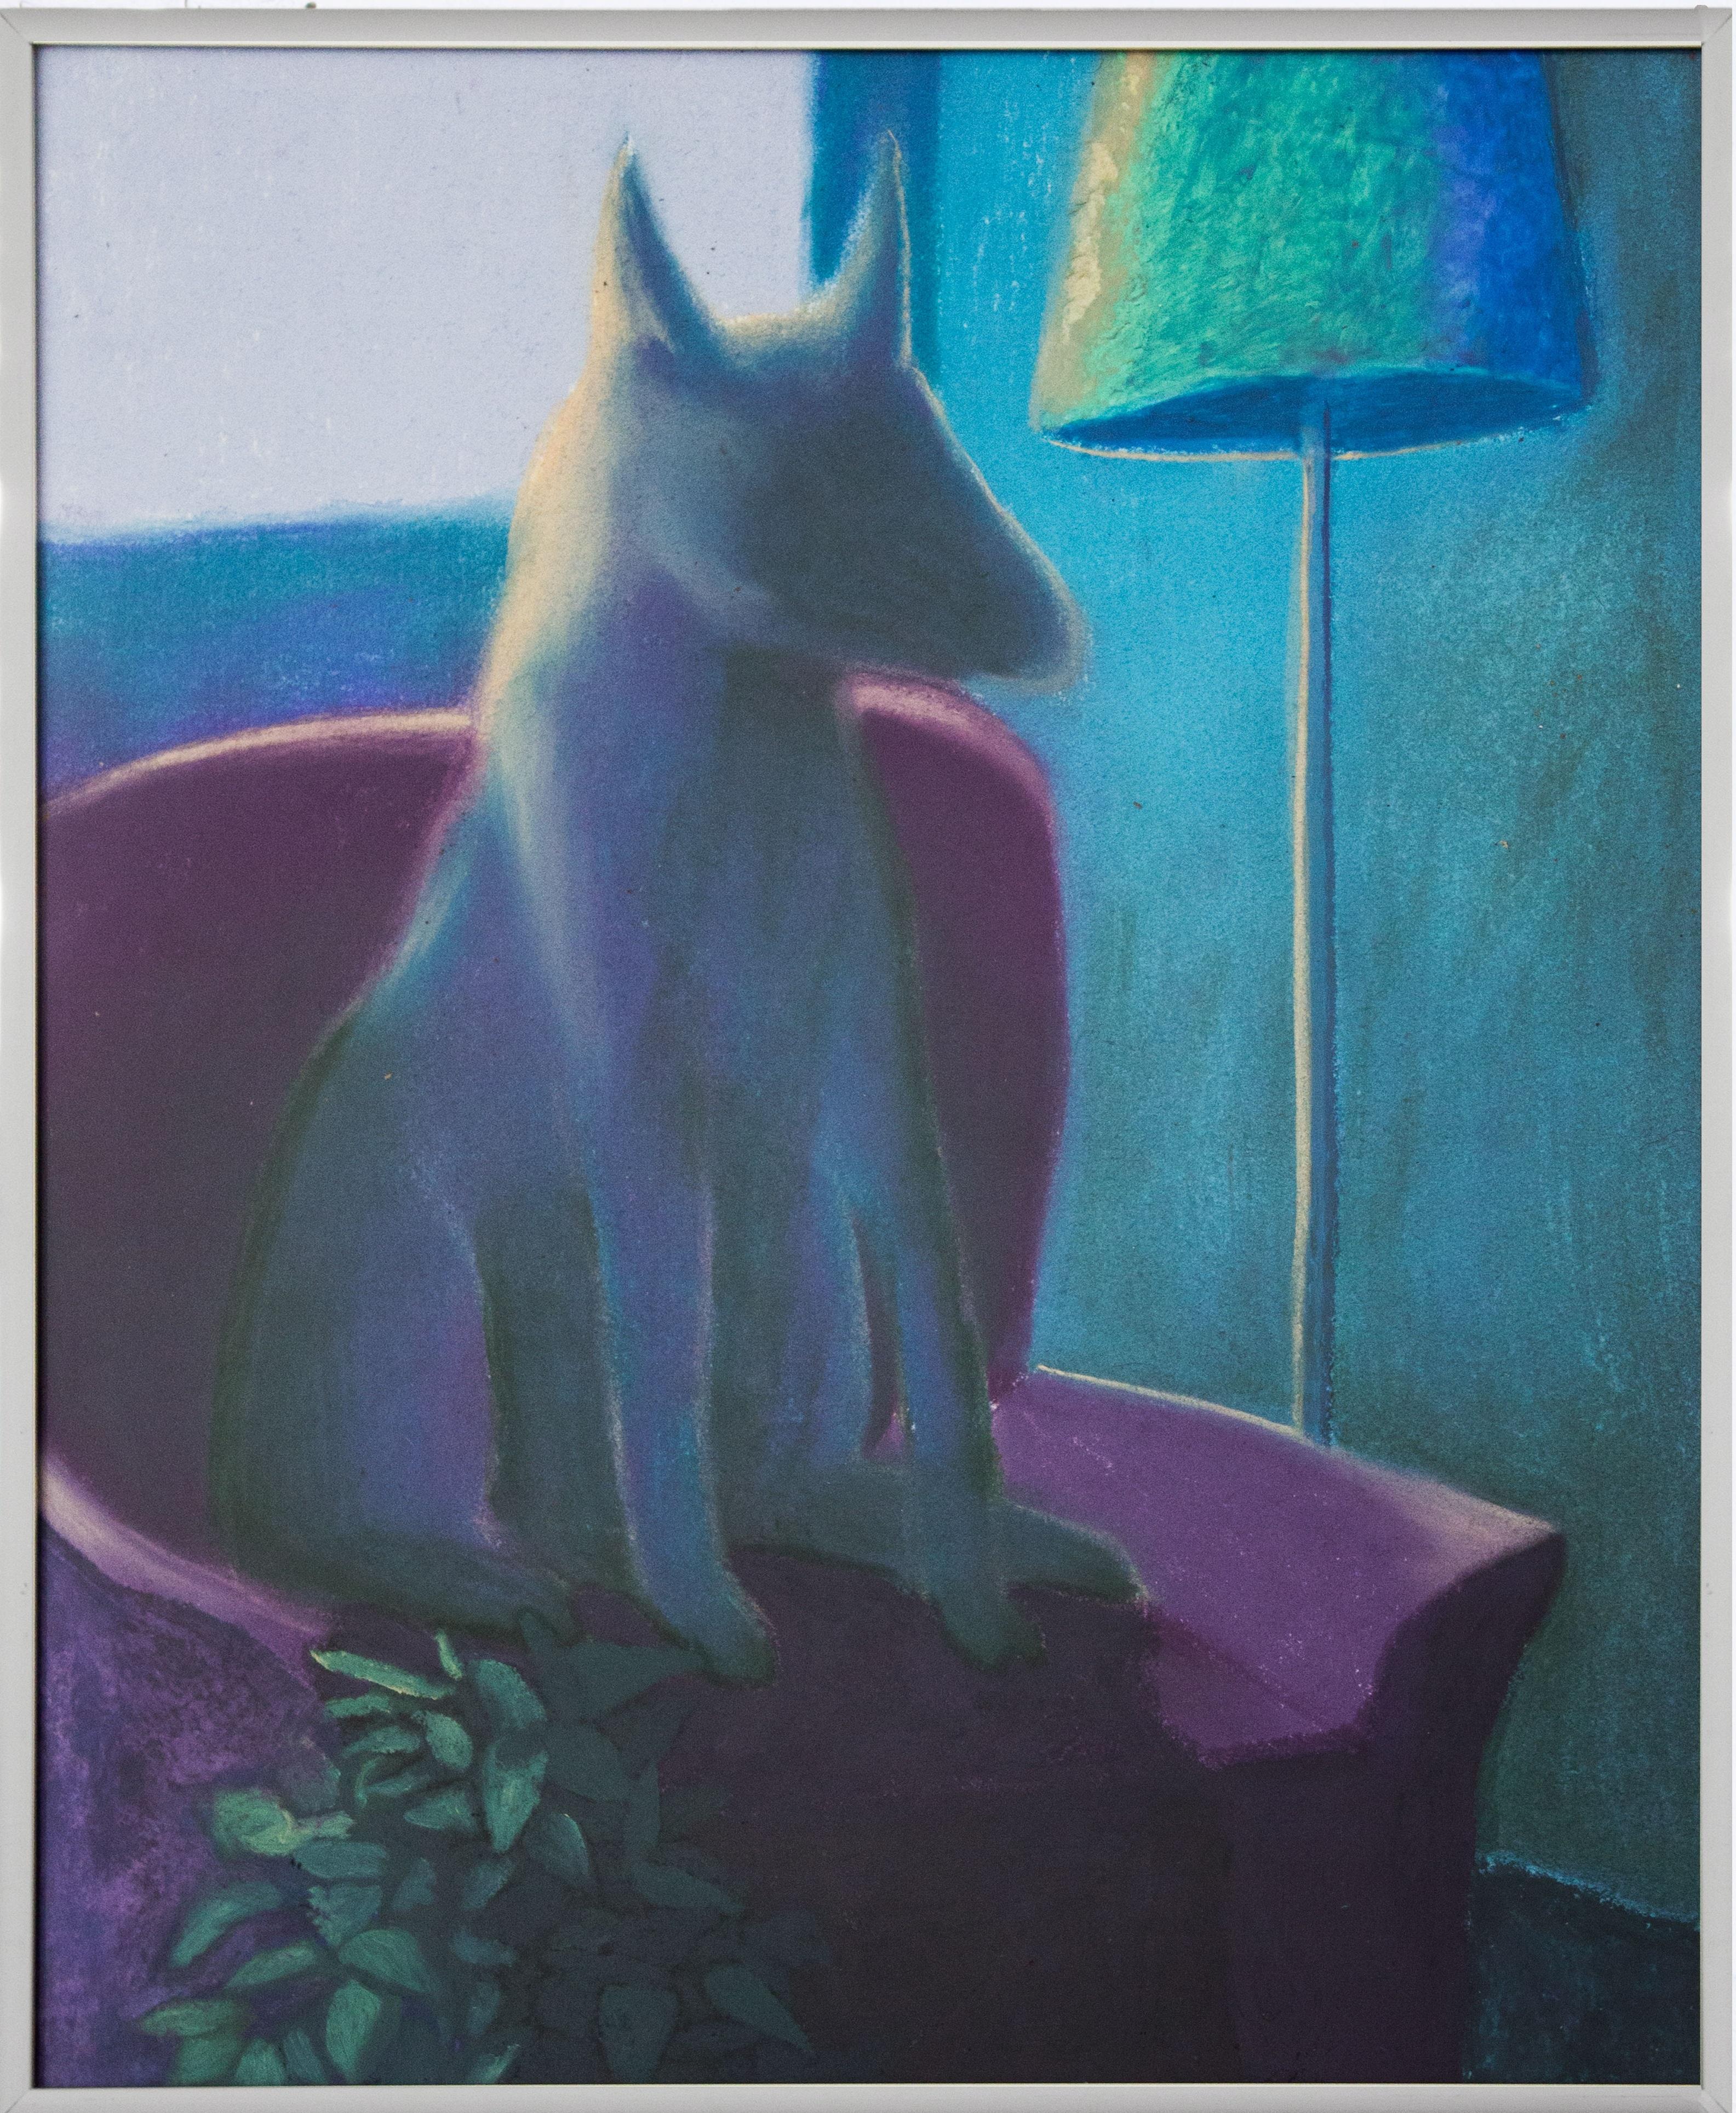 Alessandro Fogo - Untitled, 42 x 35 cm, Olio e pastelli su carta, 2019